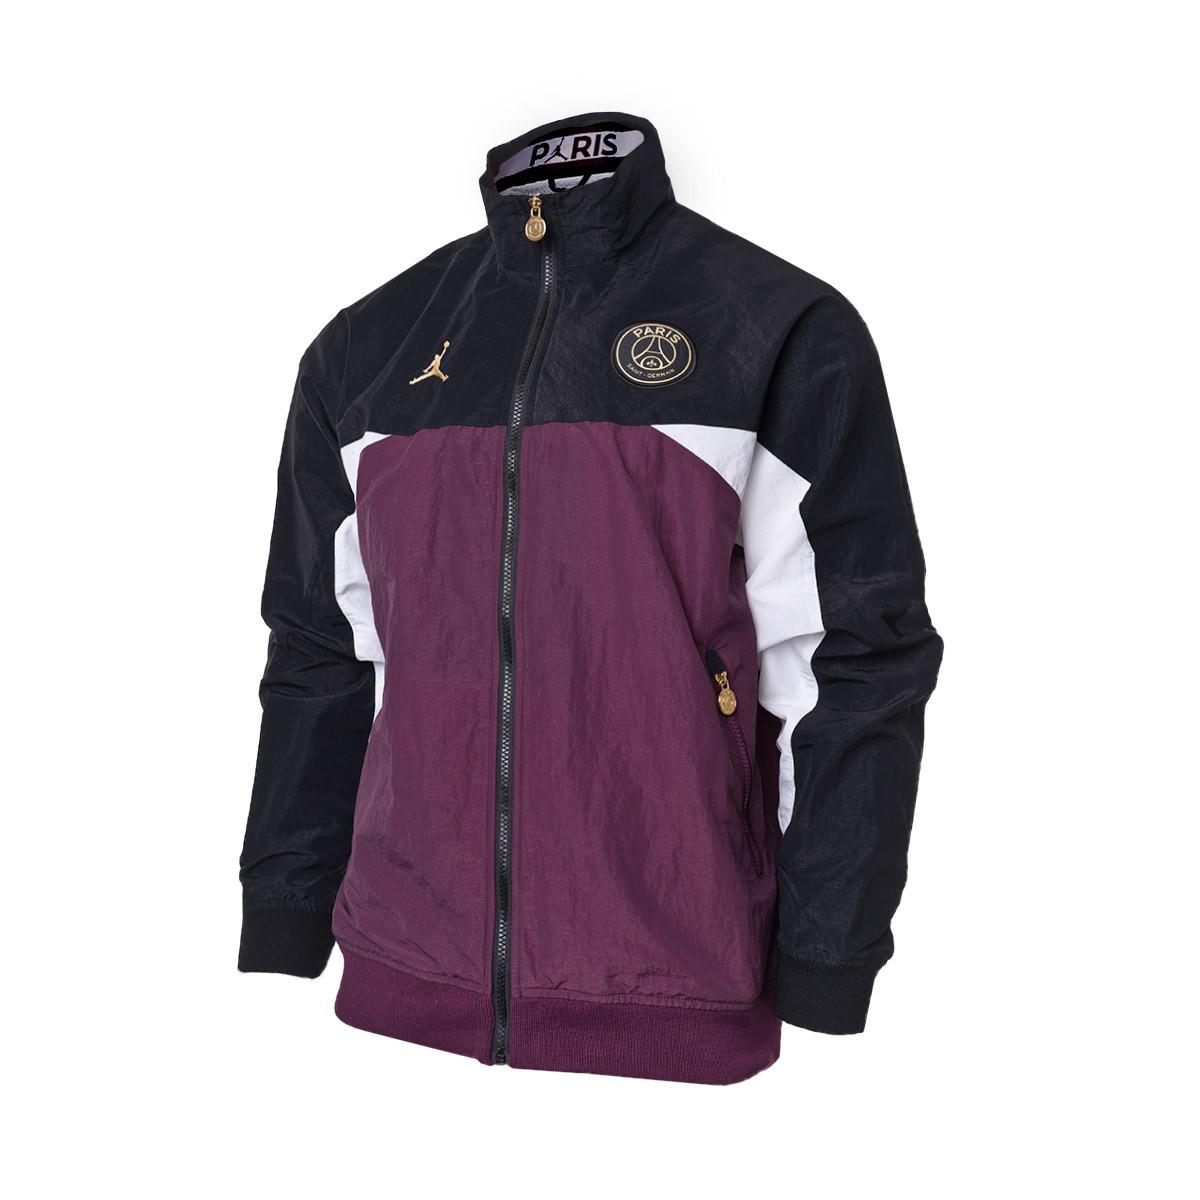 fatiga cobija Senado  Jacket Nike Jordan x Paris Saint-Germain Full-zip 2020-2021  Black-Bordeaux-White-Metallic gold - Football store Fútbol Emotion